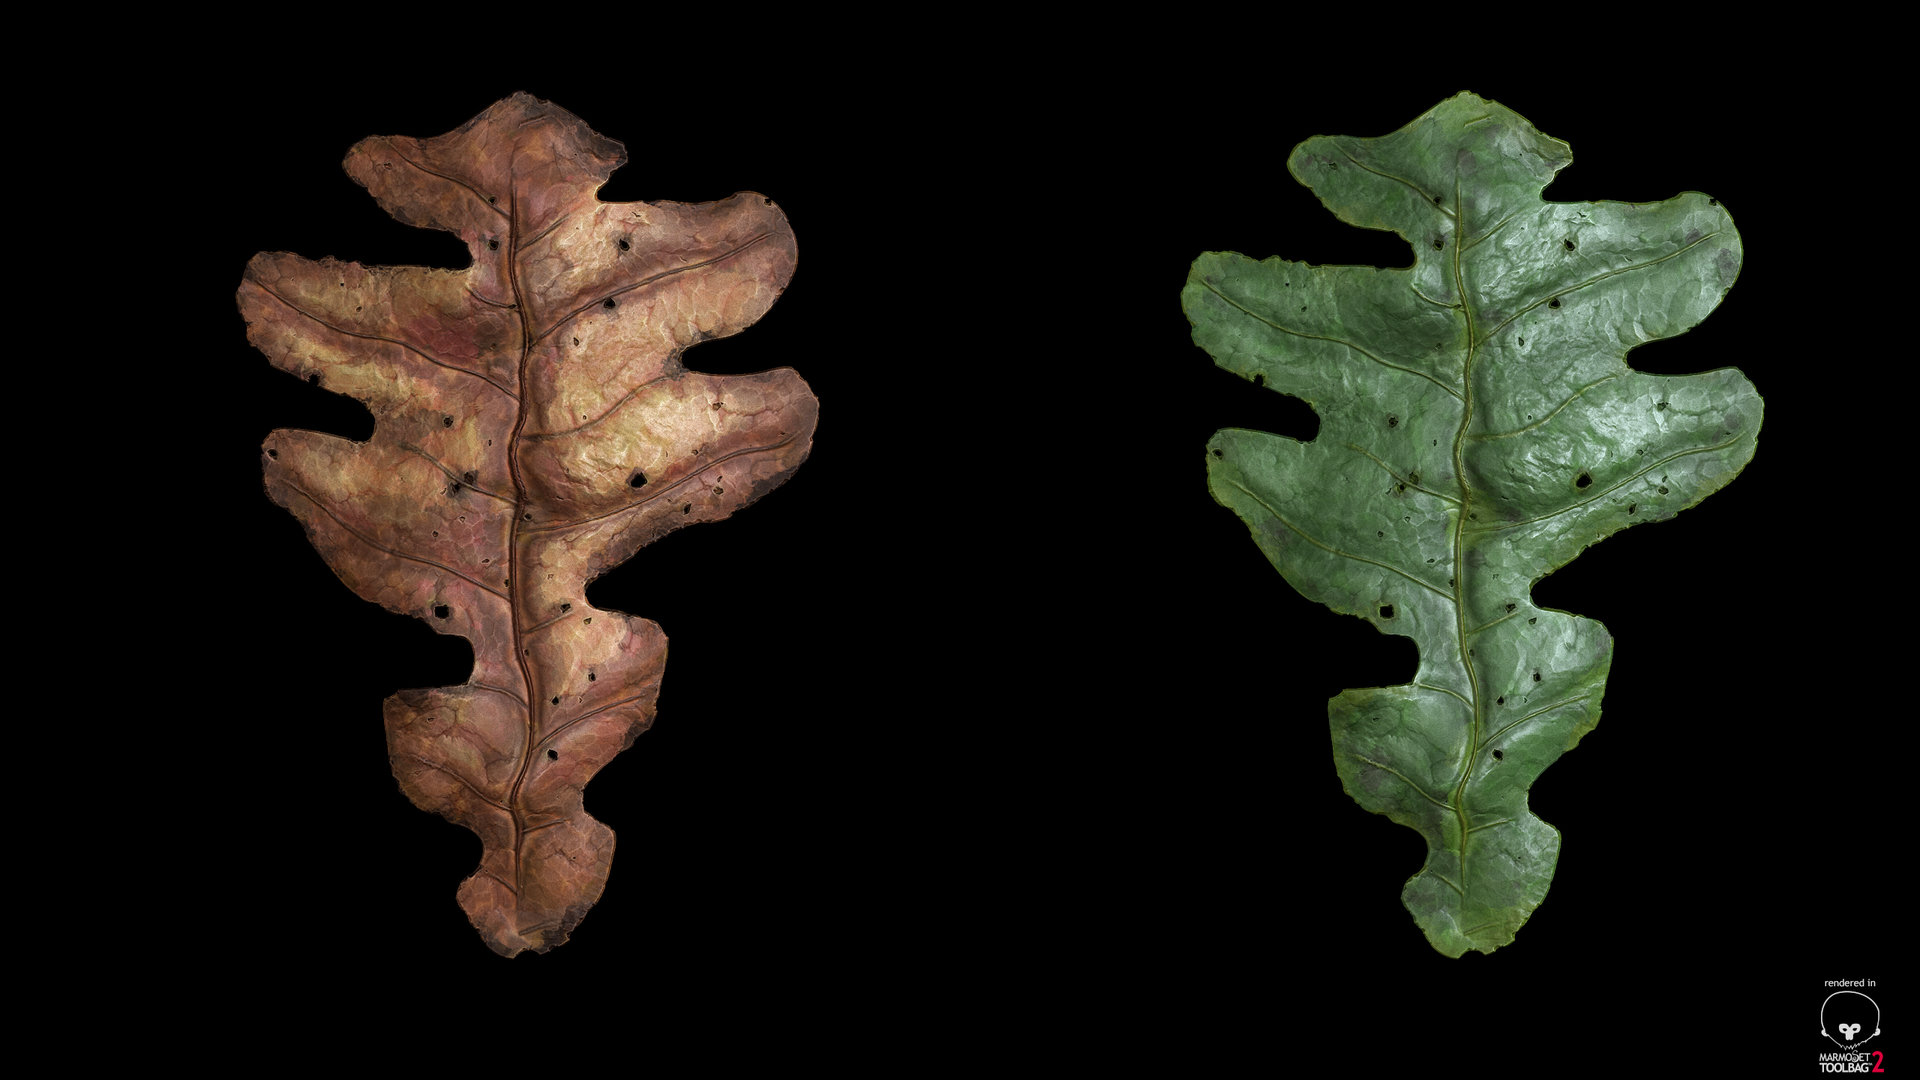 sebastian-schade-leaf1.jpg?1436909614